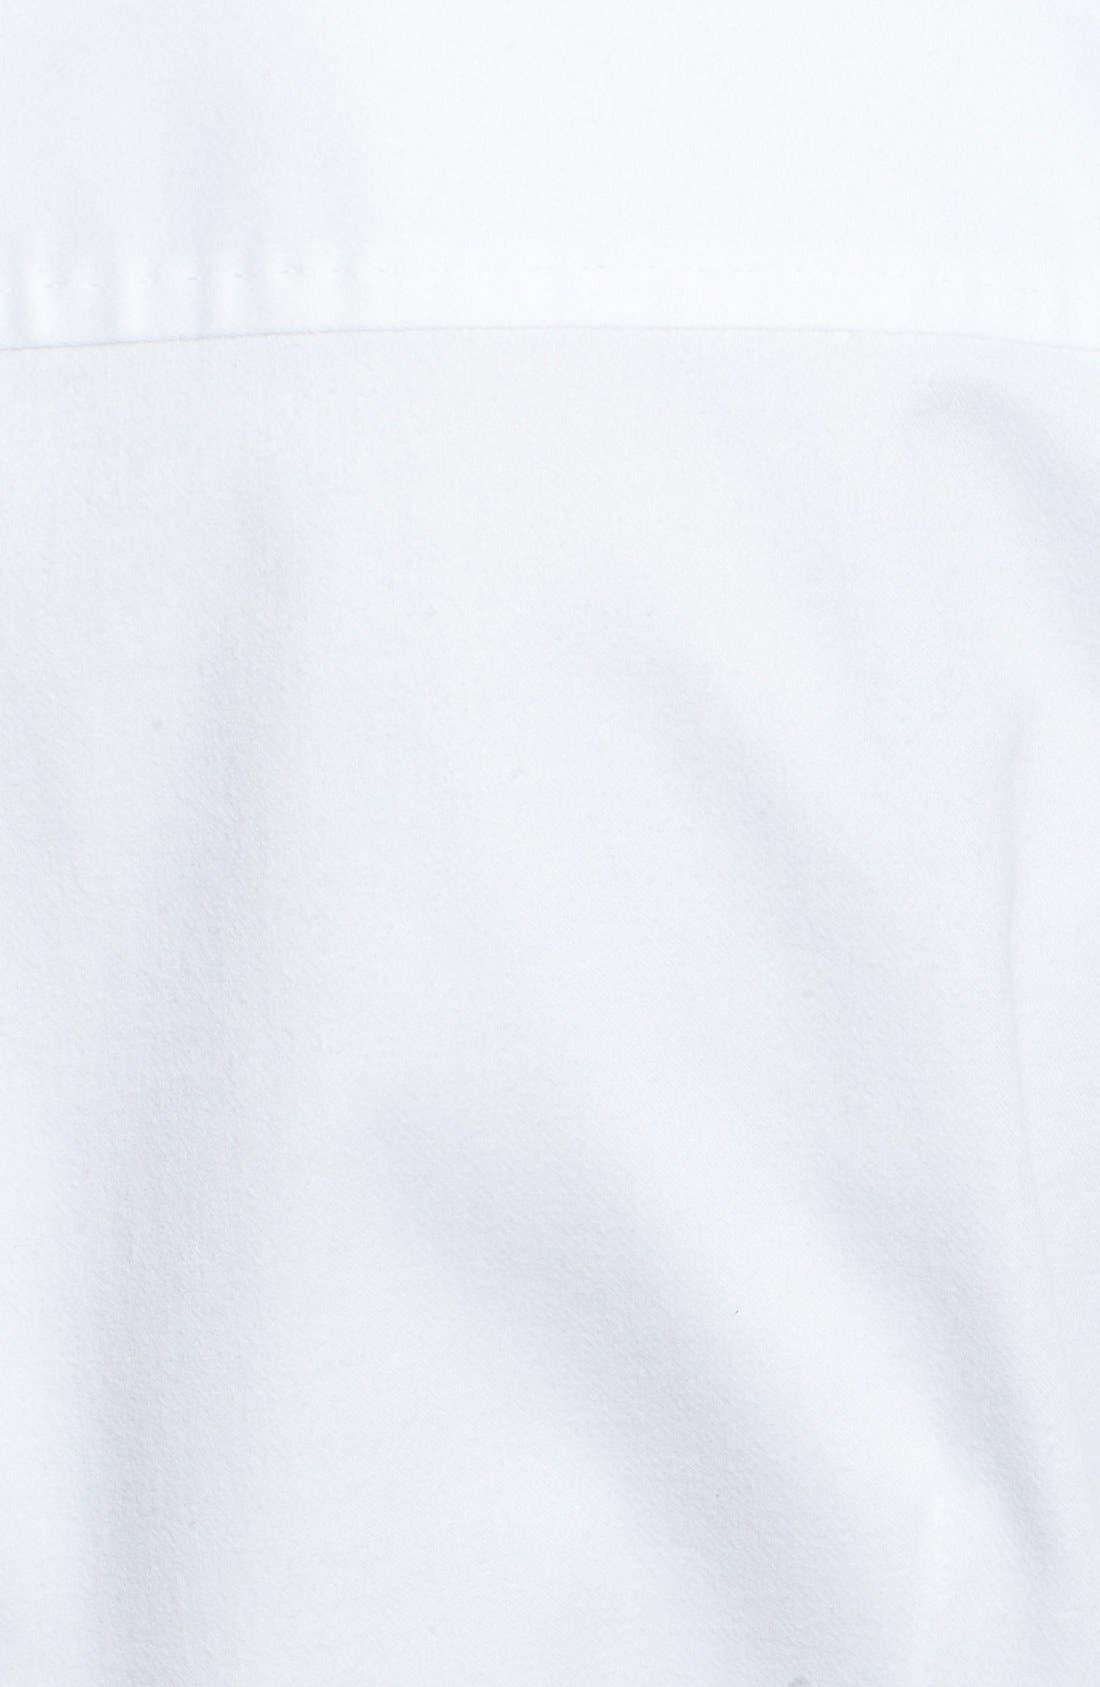 Alternate Image 3  - BOSS HUGO BOSS 'Riccarda' Contrast Trim Long Sleeve Shirt